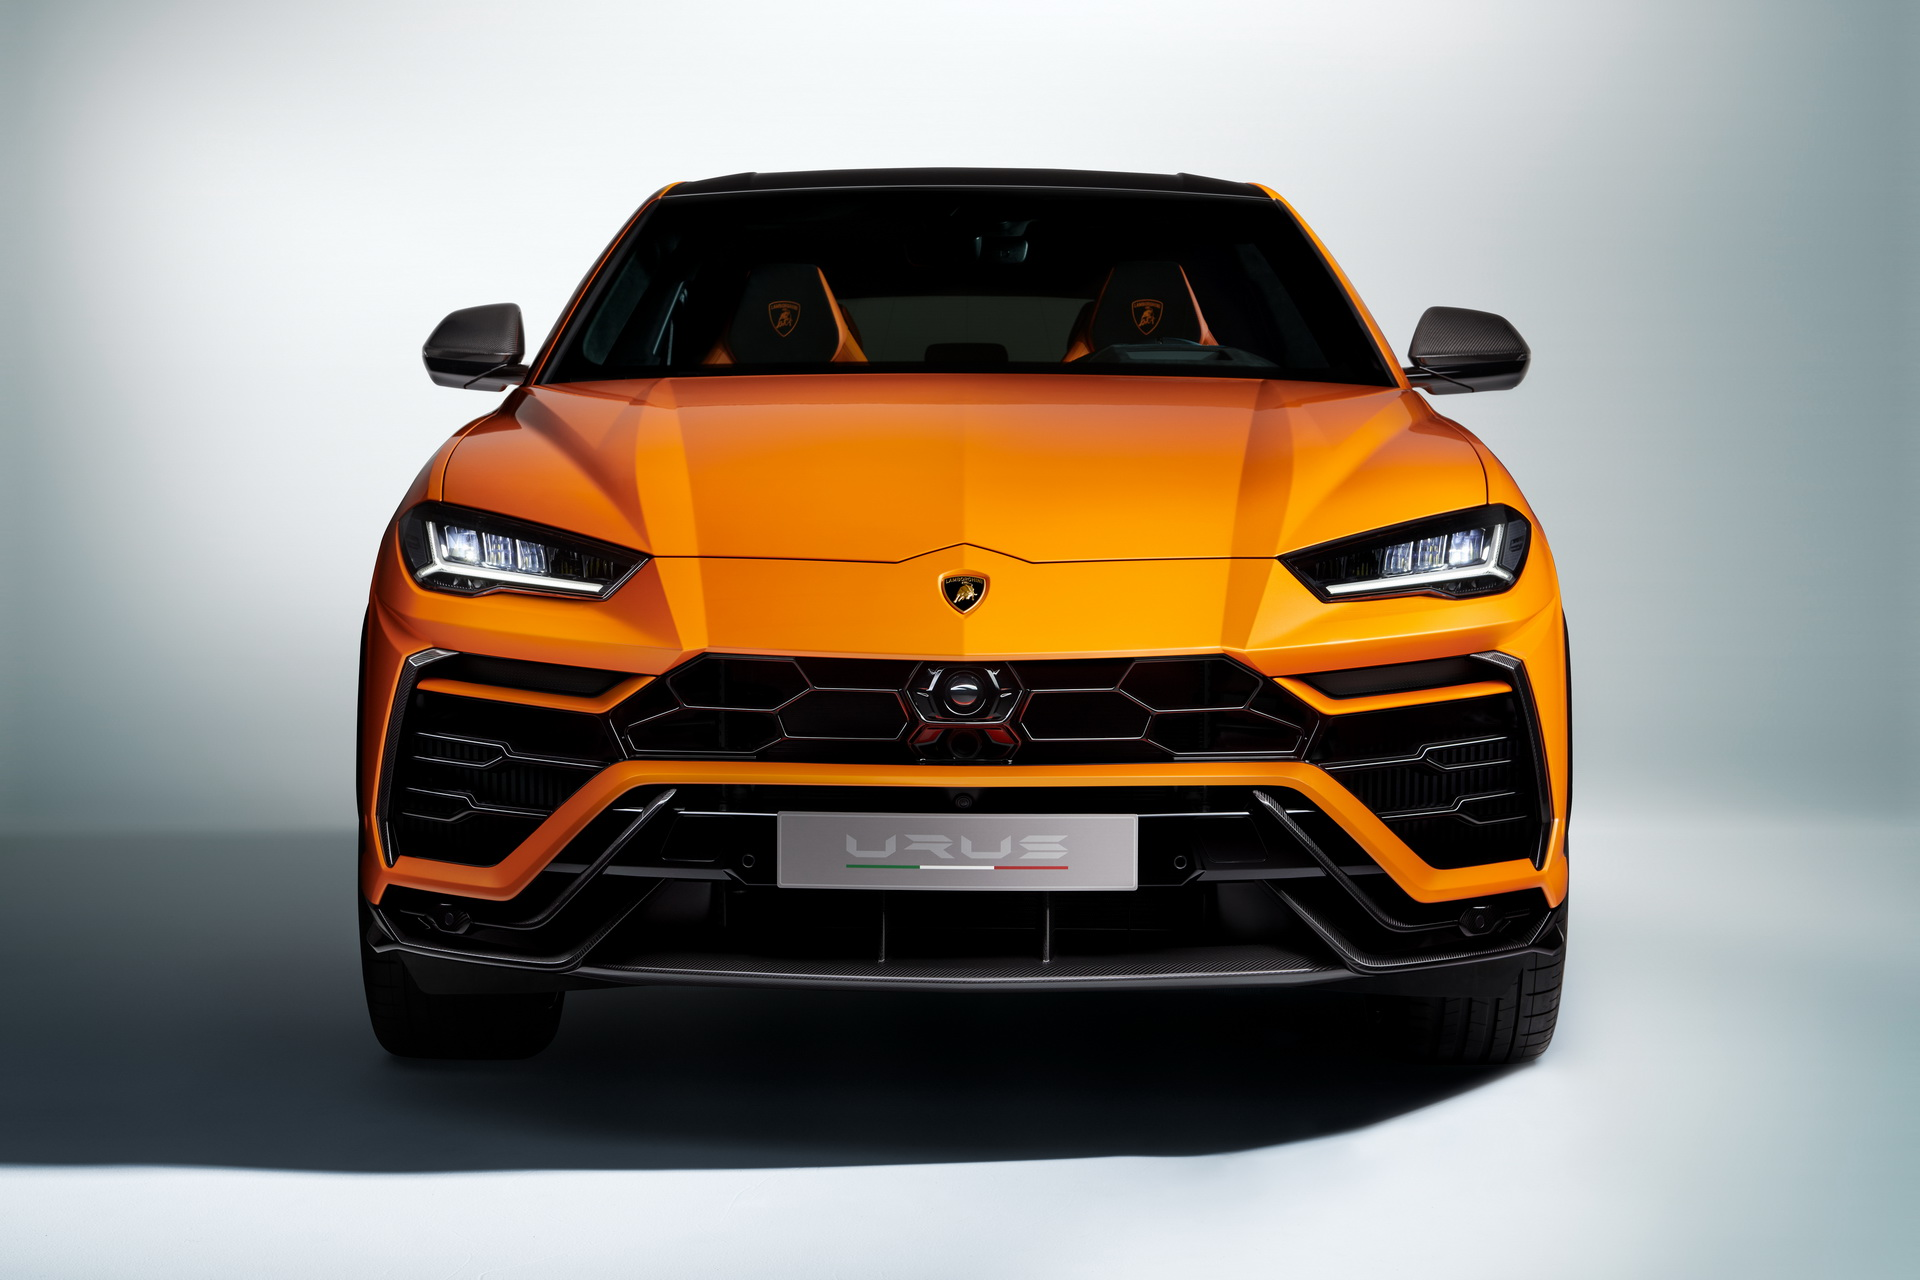 Lamborghini-Urus-Pearl-Capsule-Edition-14